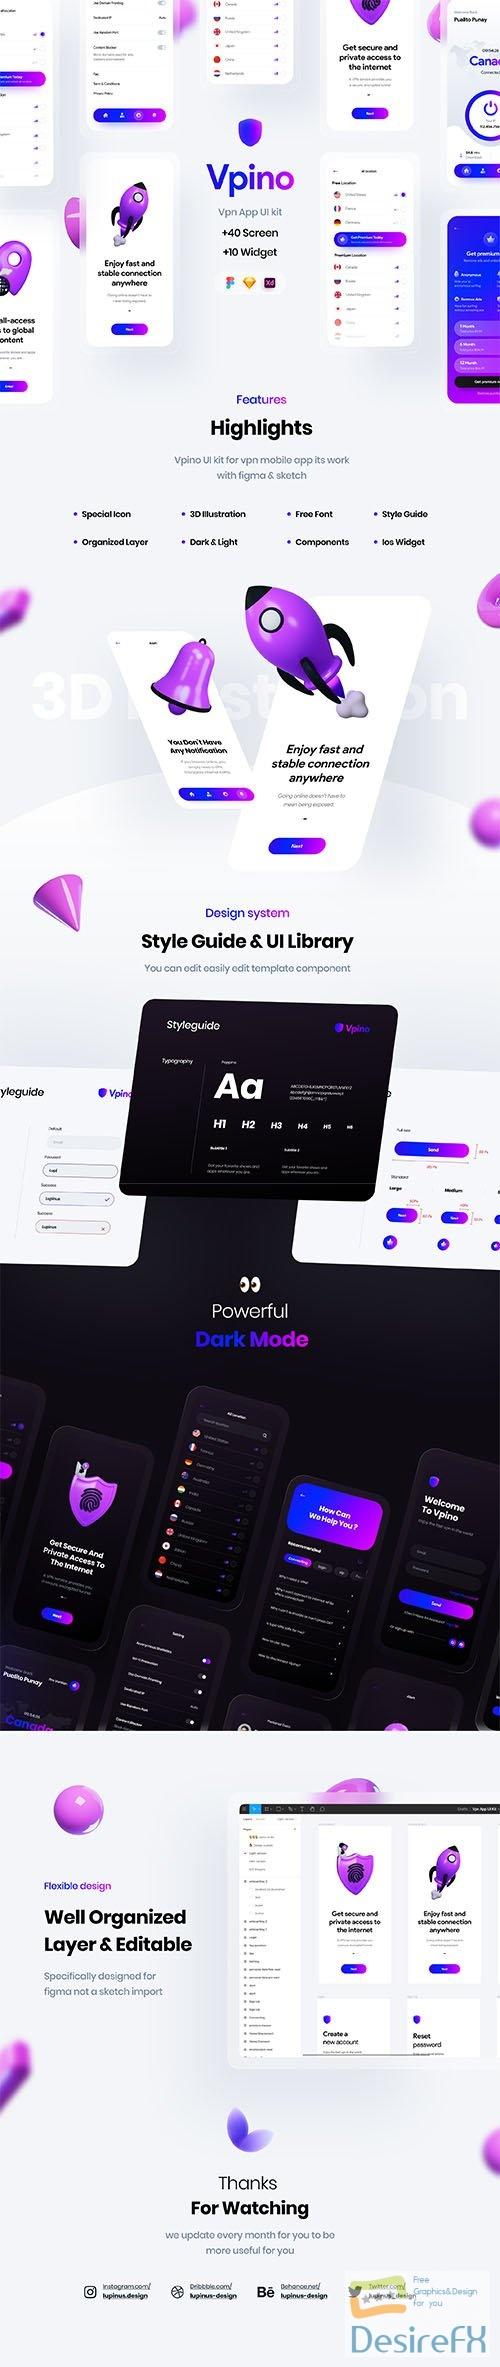 Vpino   Vpn app UI kit - UI8